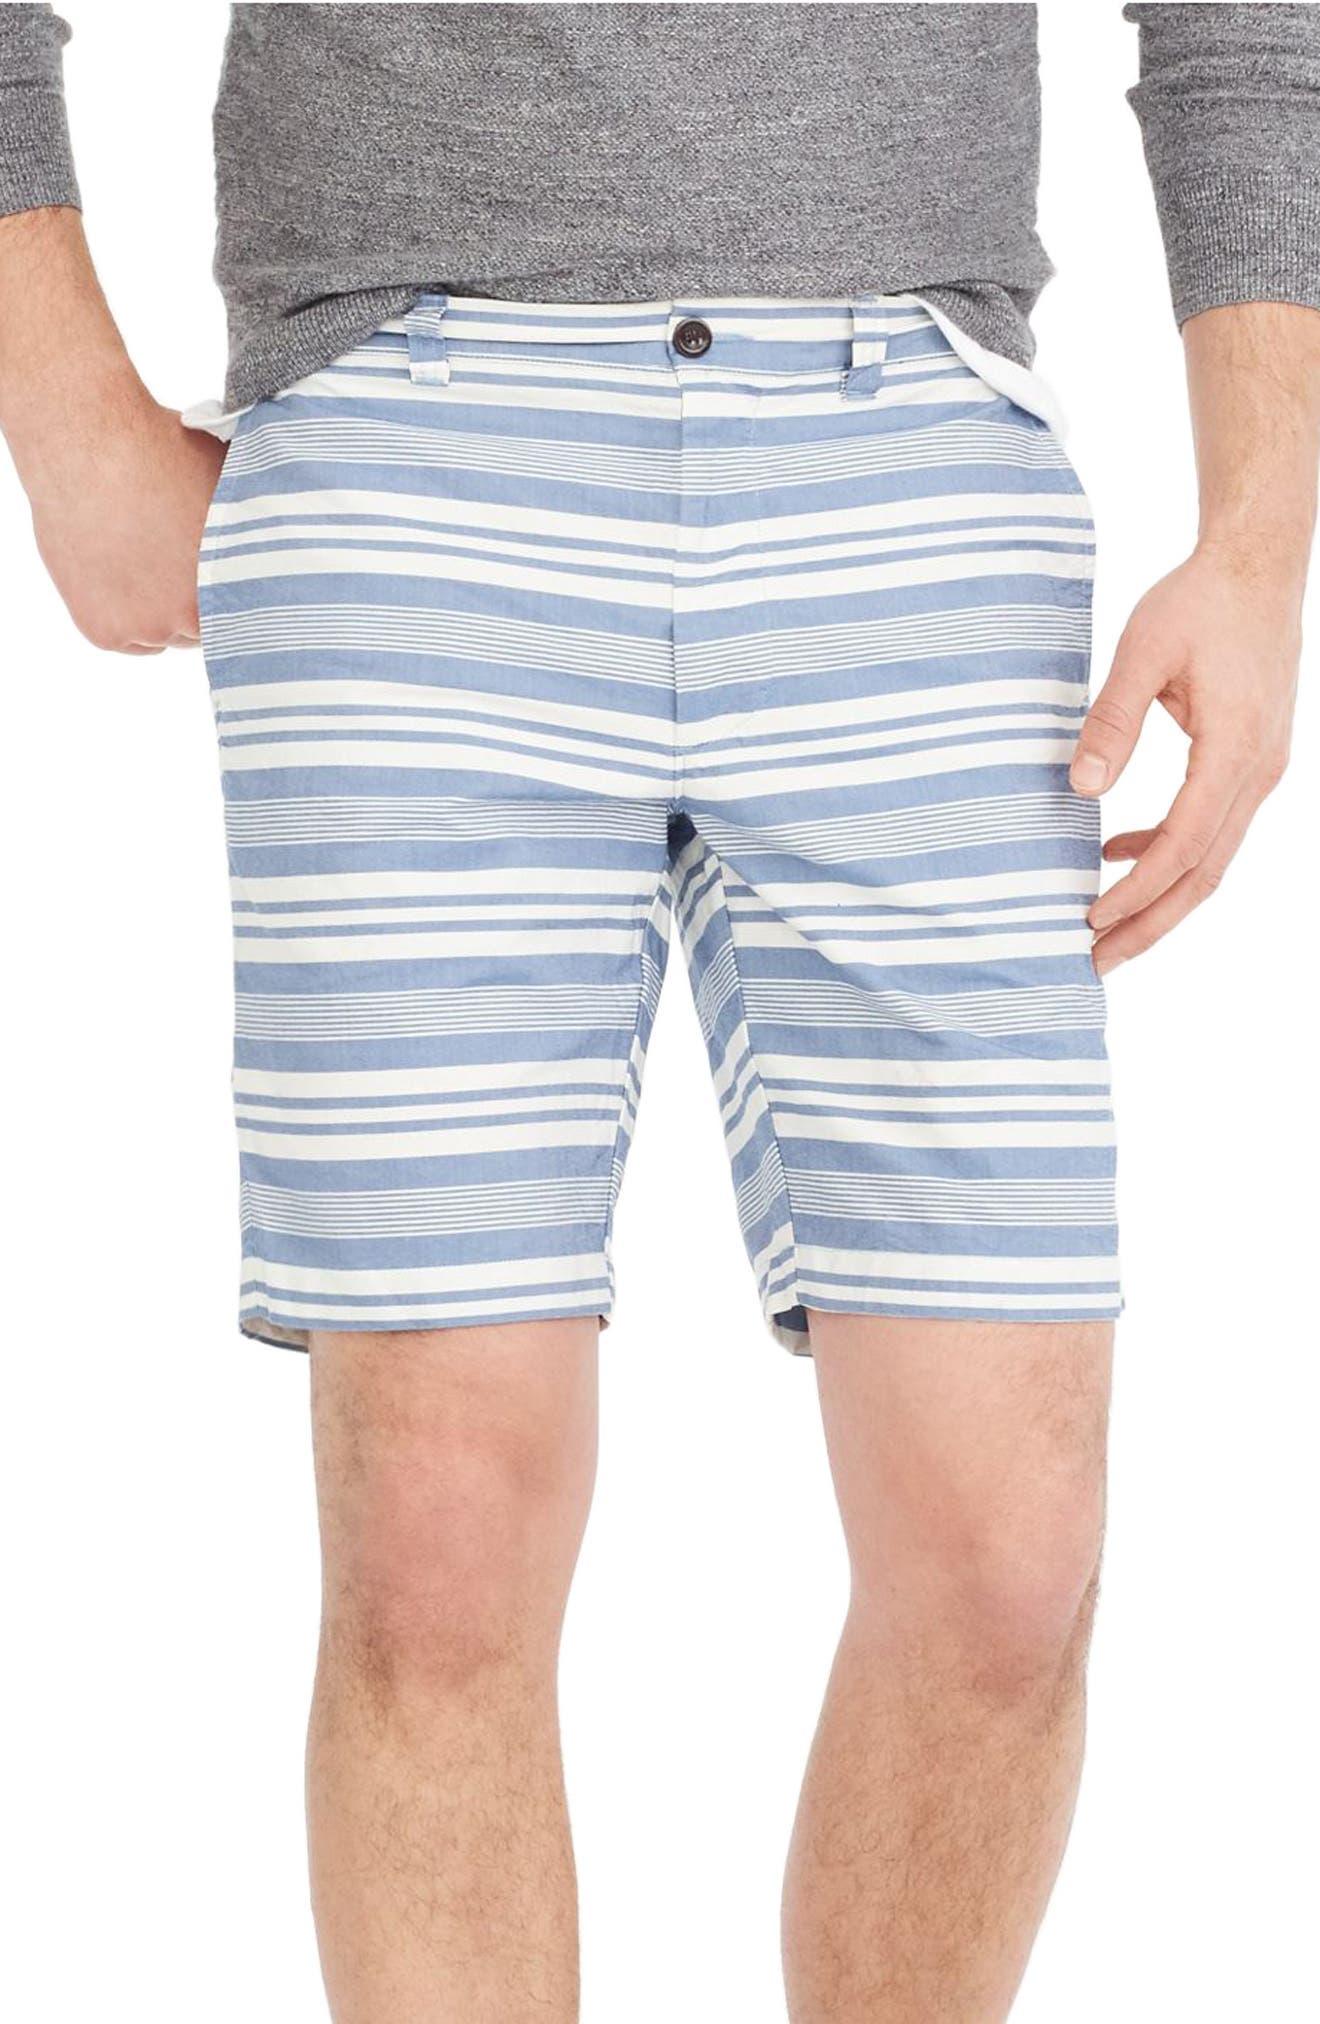 Stripe Oxford Shorts,                             Main thumbnail 1, color,                             White/ Blue